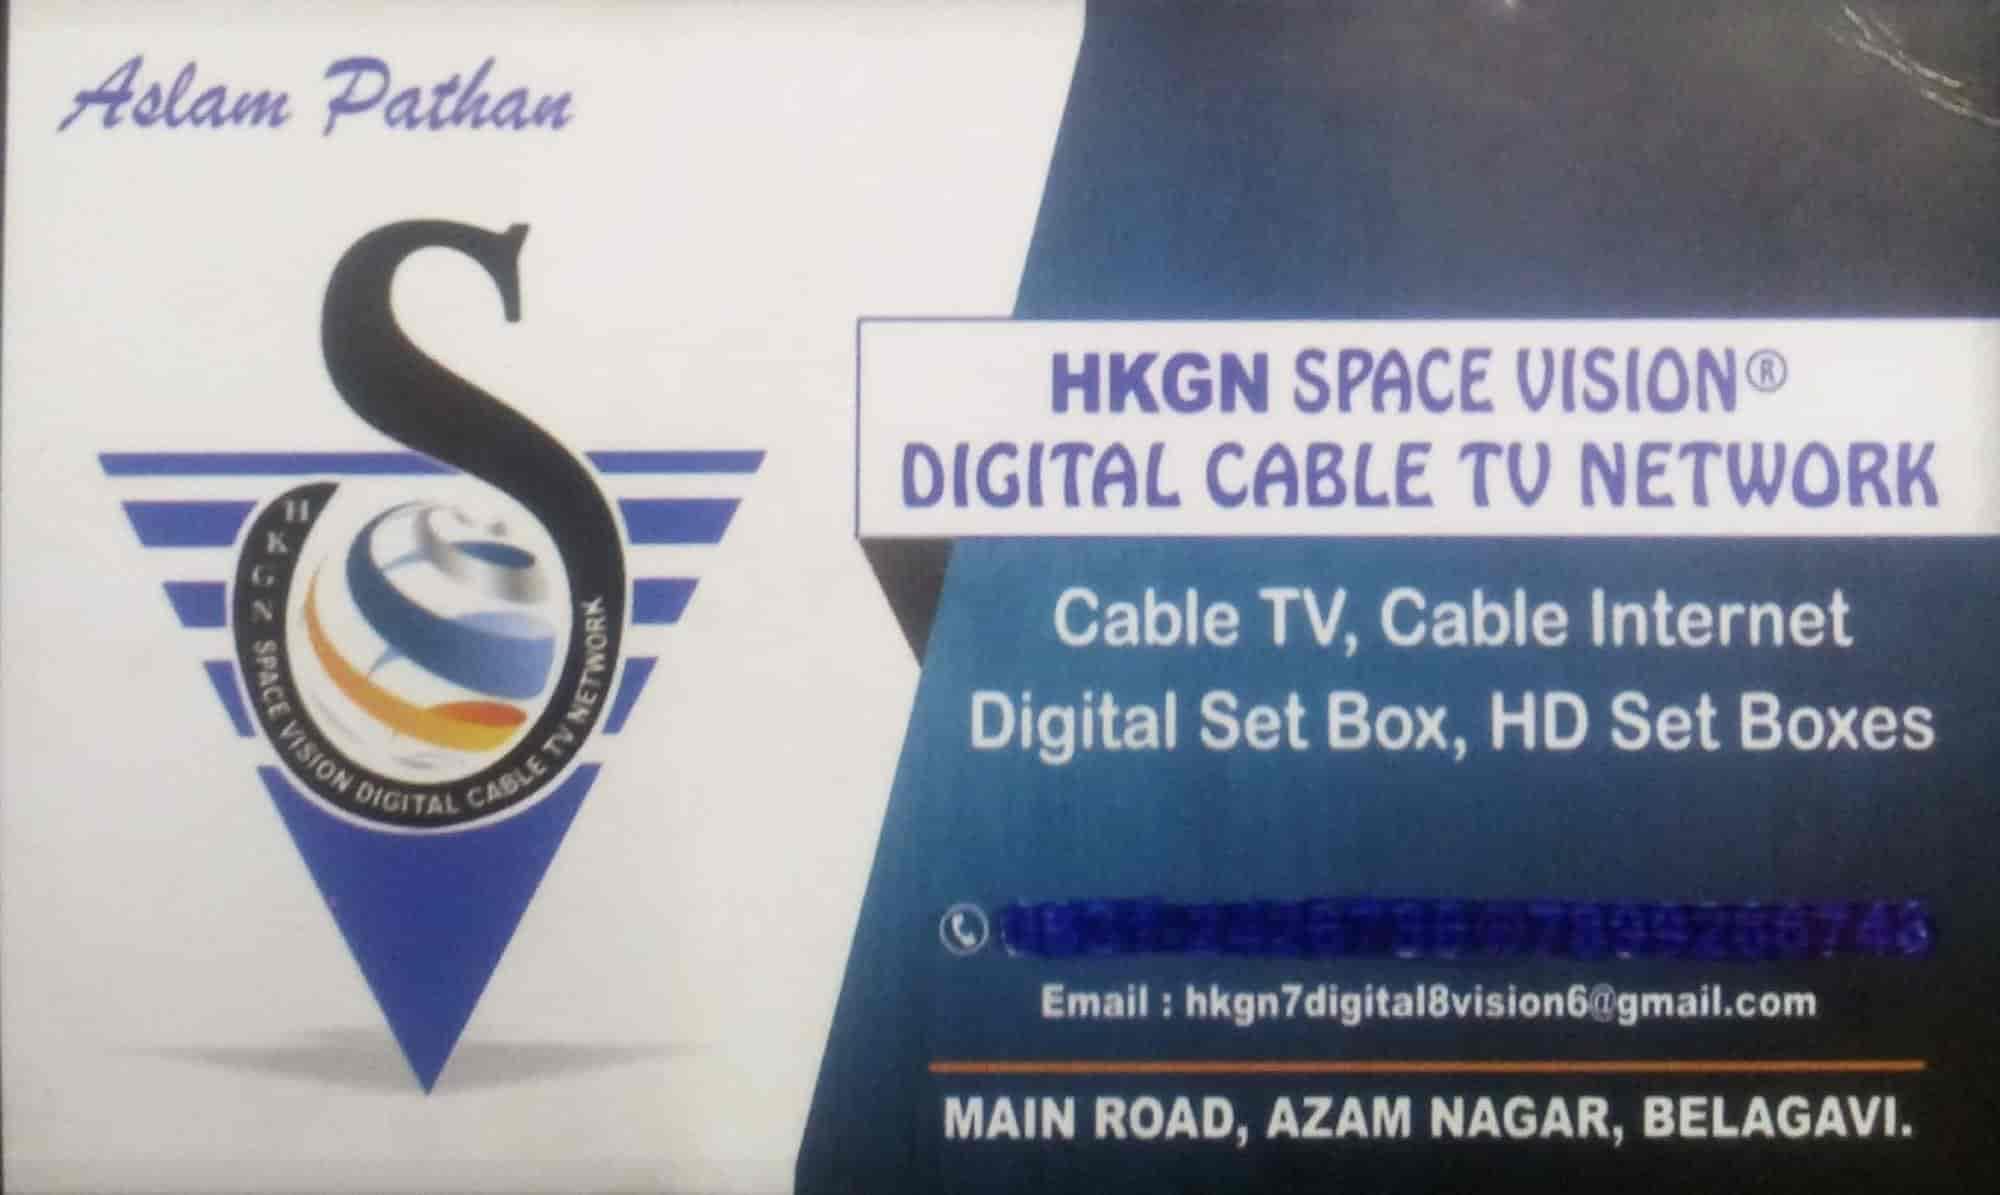 HKGN Space Vision Digital Cable Tv Network, Azam Nagar Belgaum